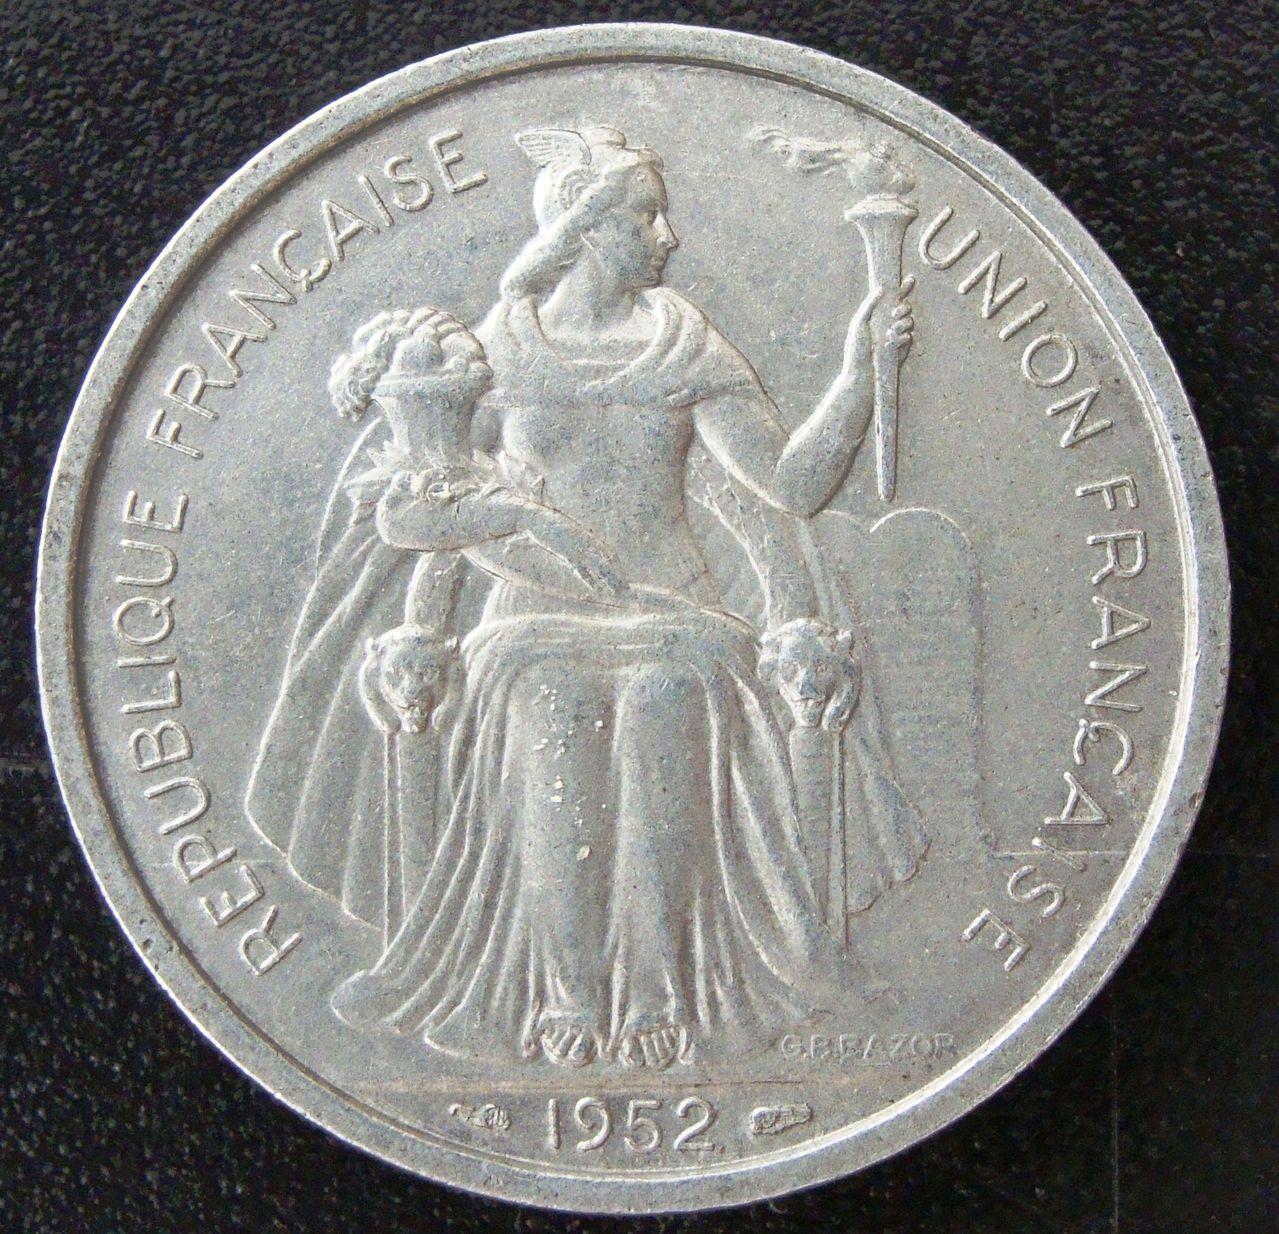 5 Francos. Oceanía francesa (1952) PLI_5_Francos_1952_anv